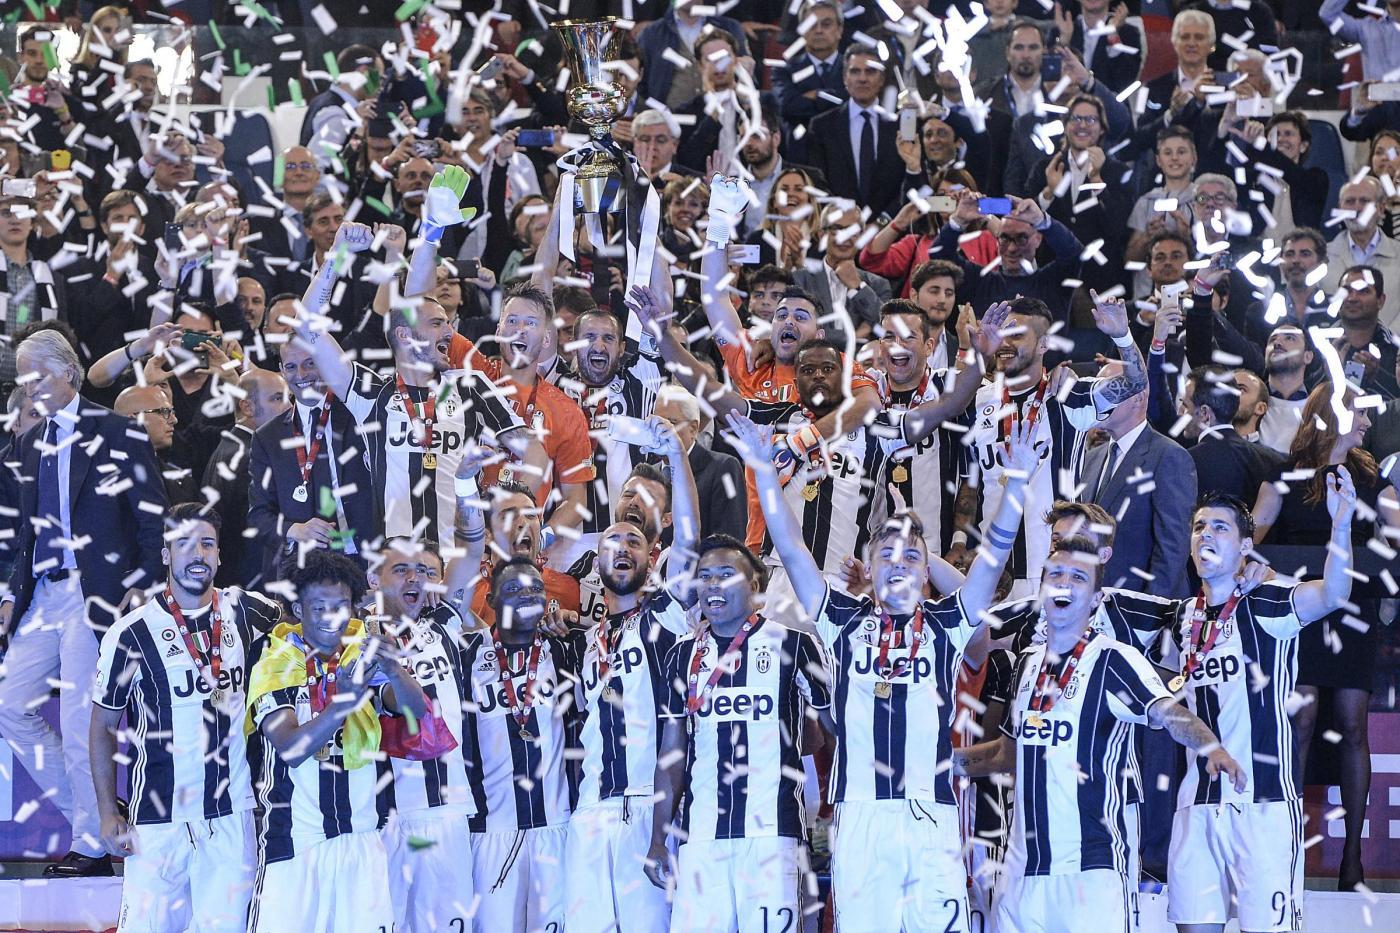 Finale coppa Italia 2016: Milan-Juventus 0-1, gol di Morata